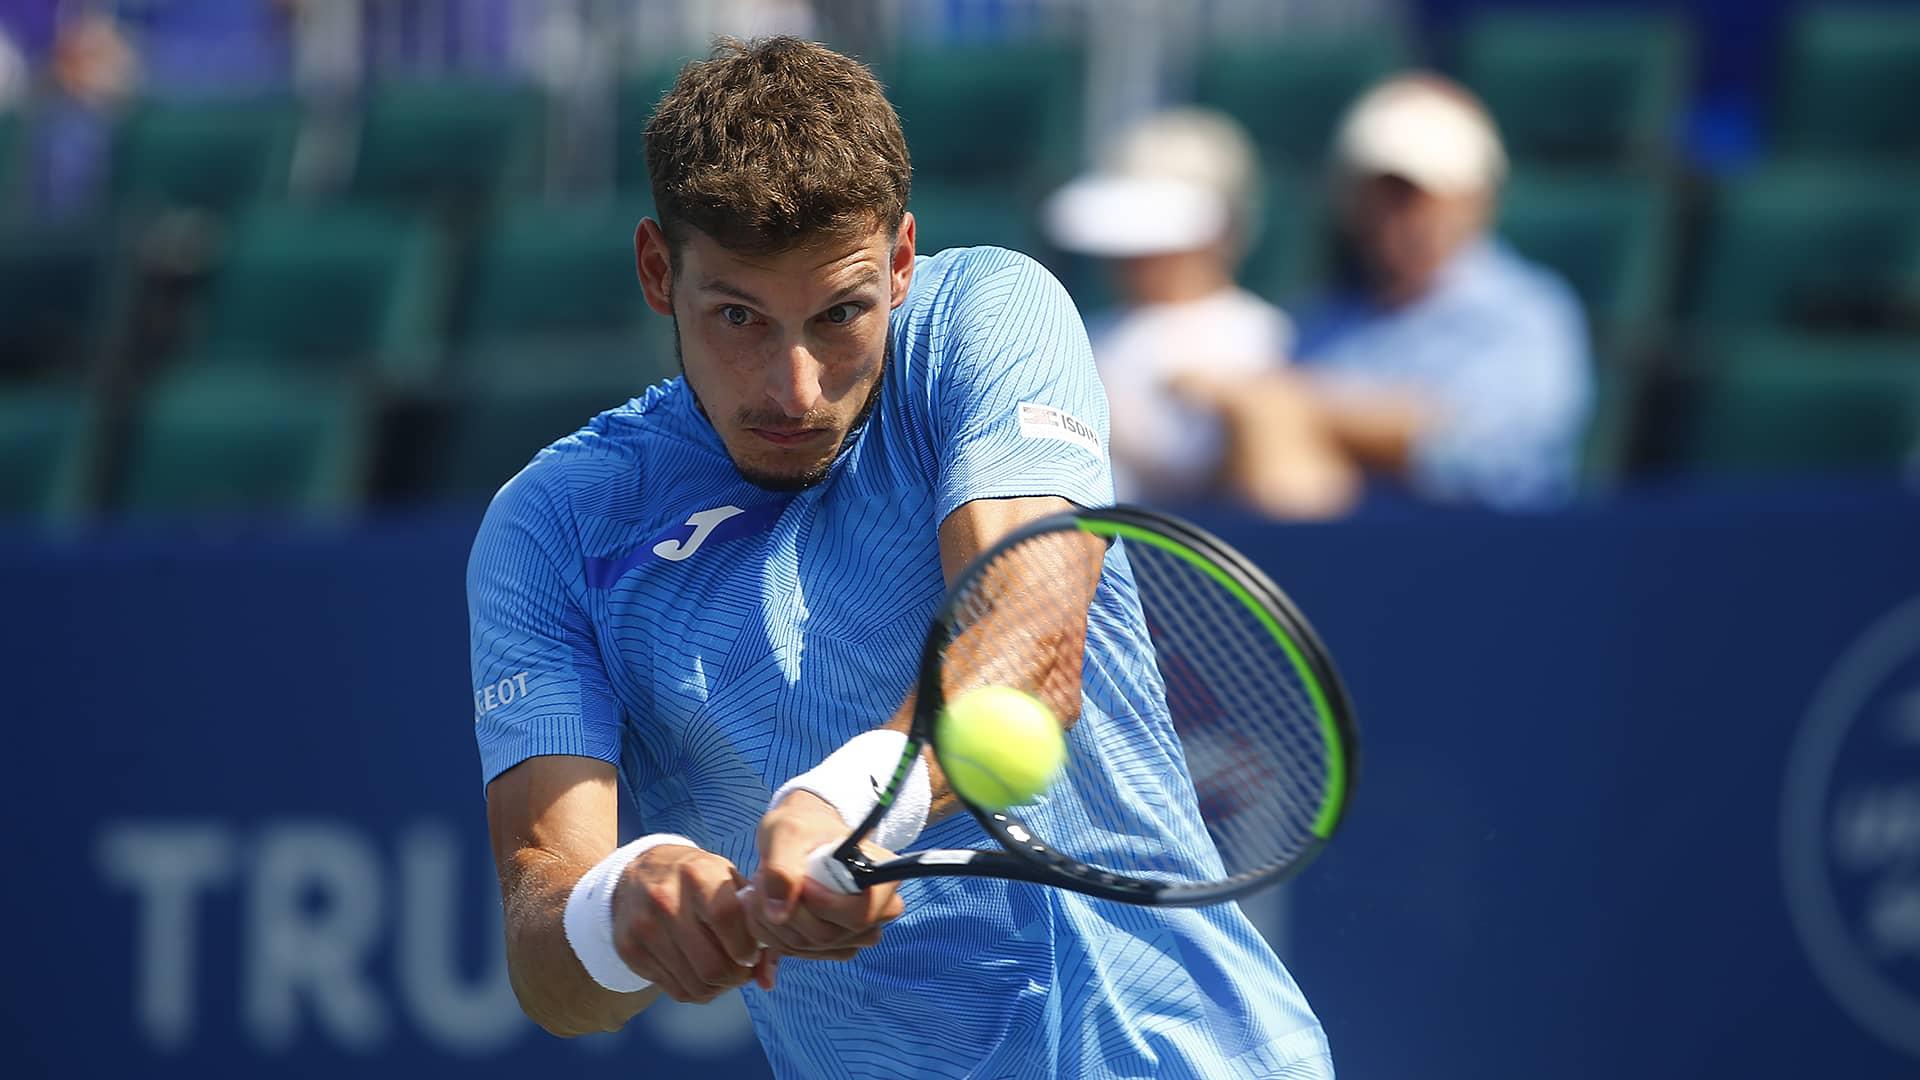 Winston-Salem Open 2021: Pablo Carreno Busta vs Ilya Ivashka Tennis Pick and Prediction